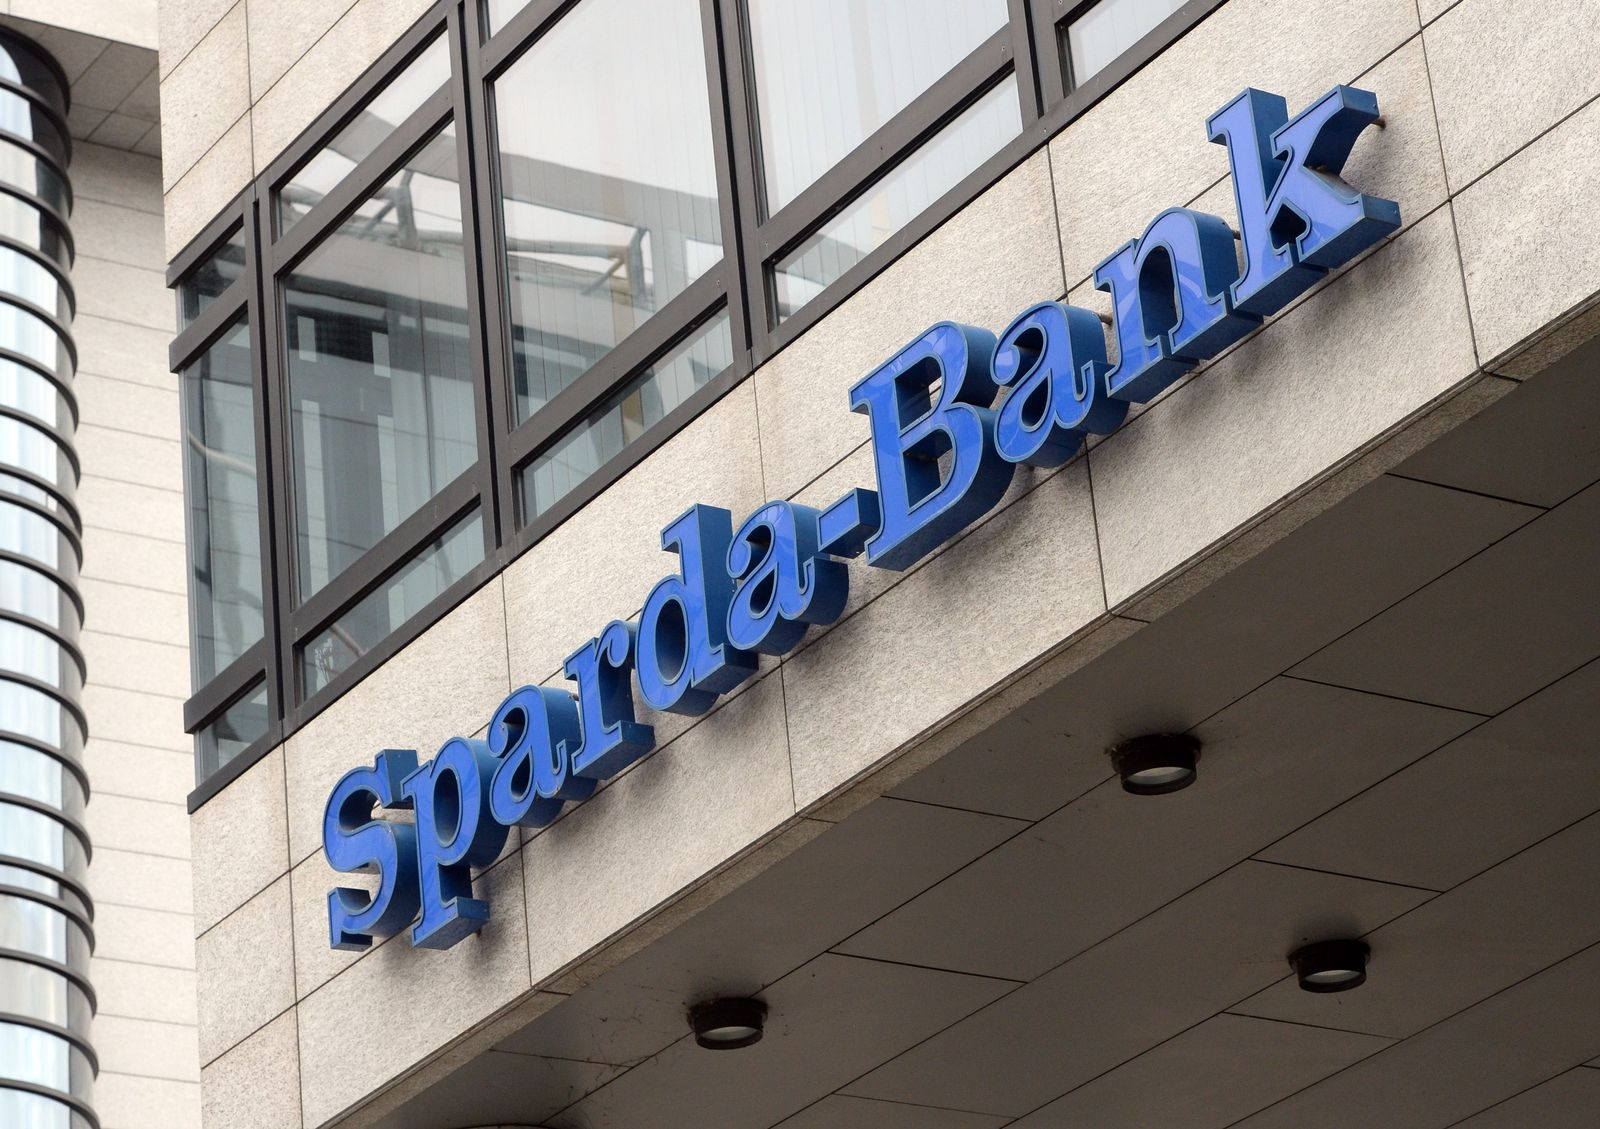 Sparda-Bank Baden-Württemberg